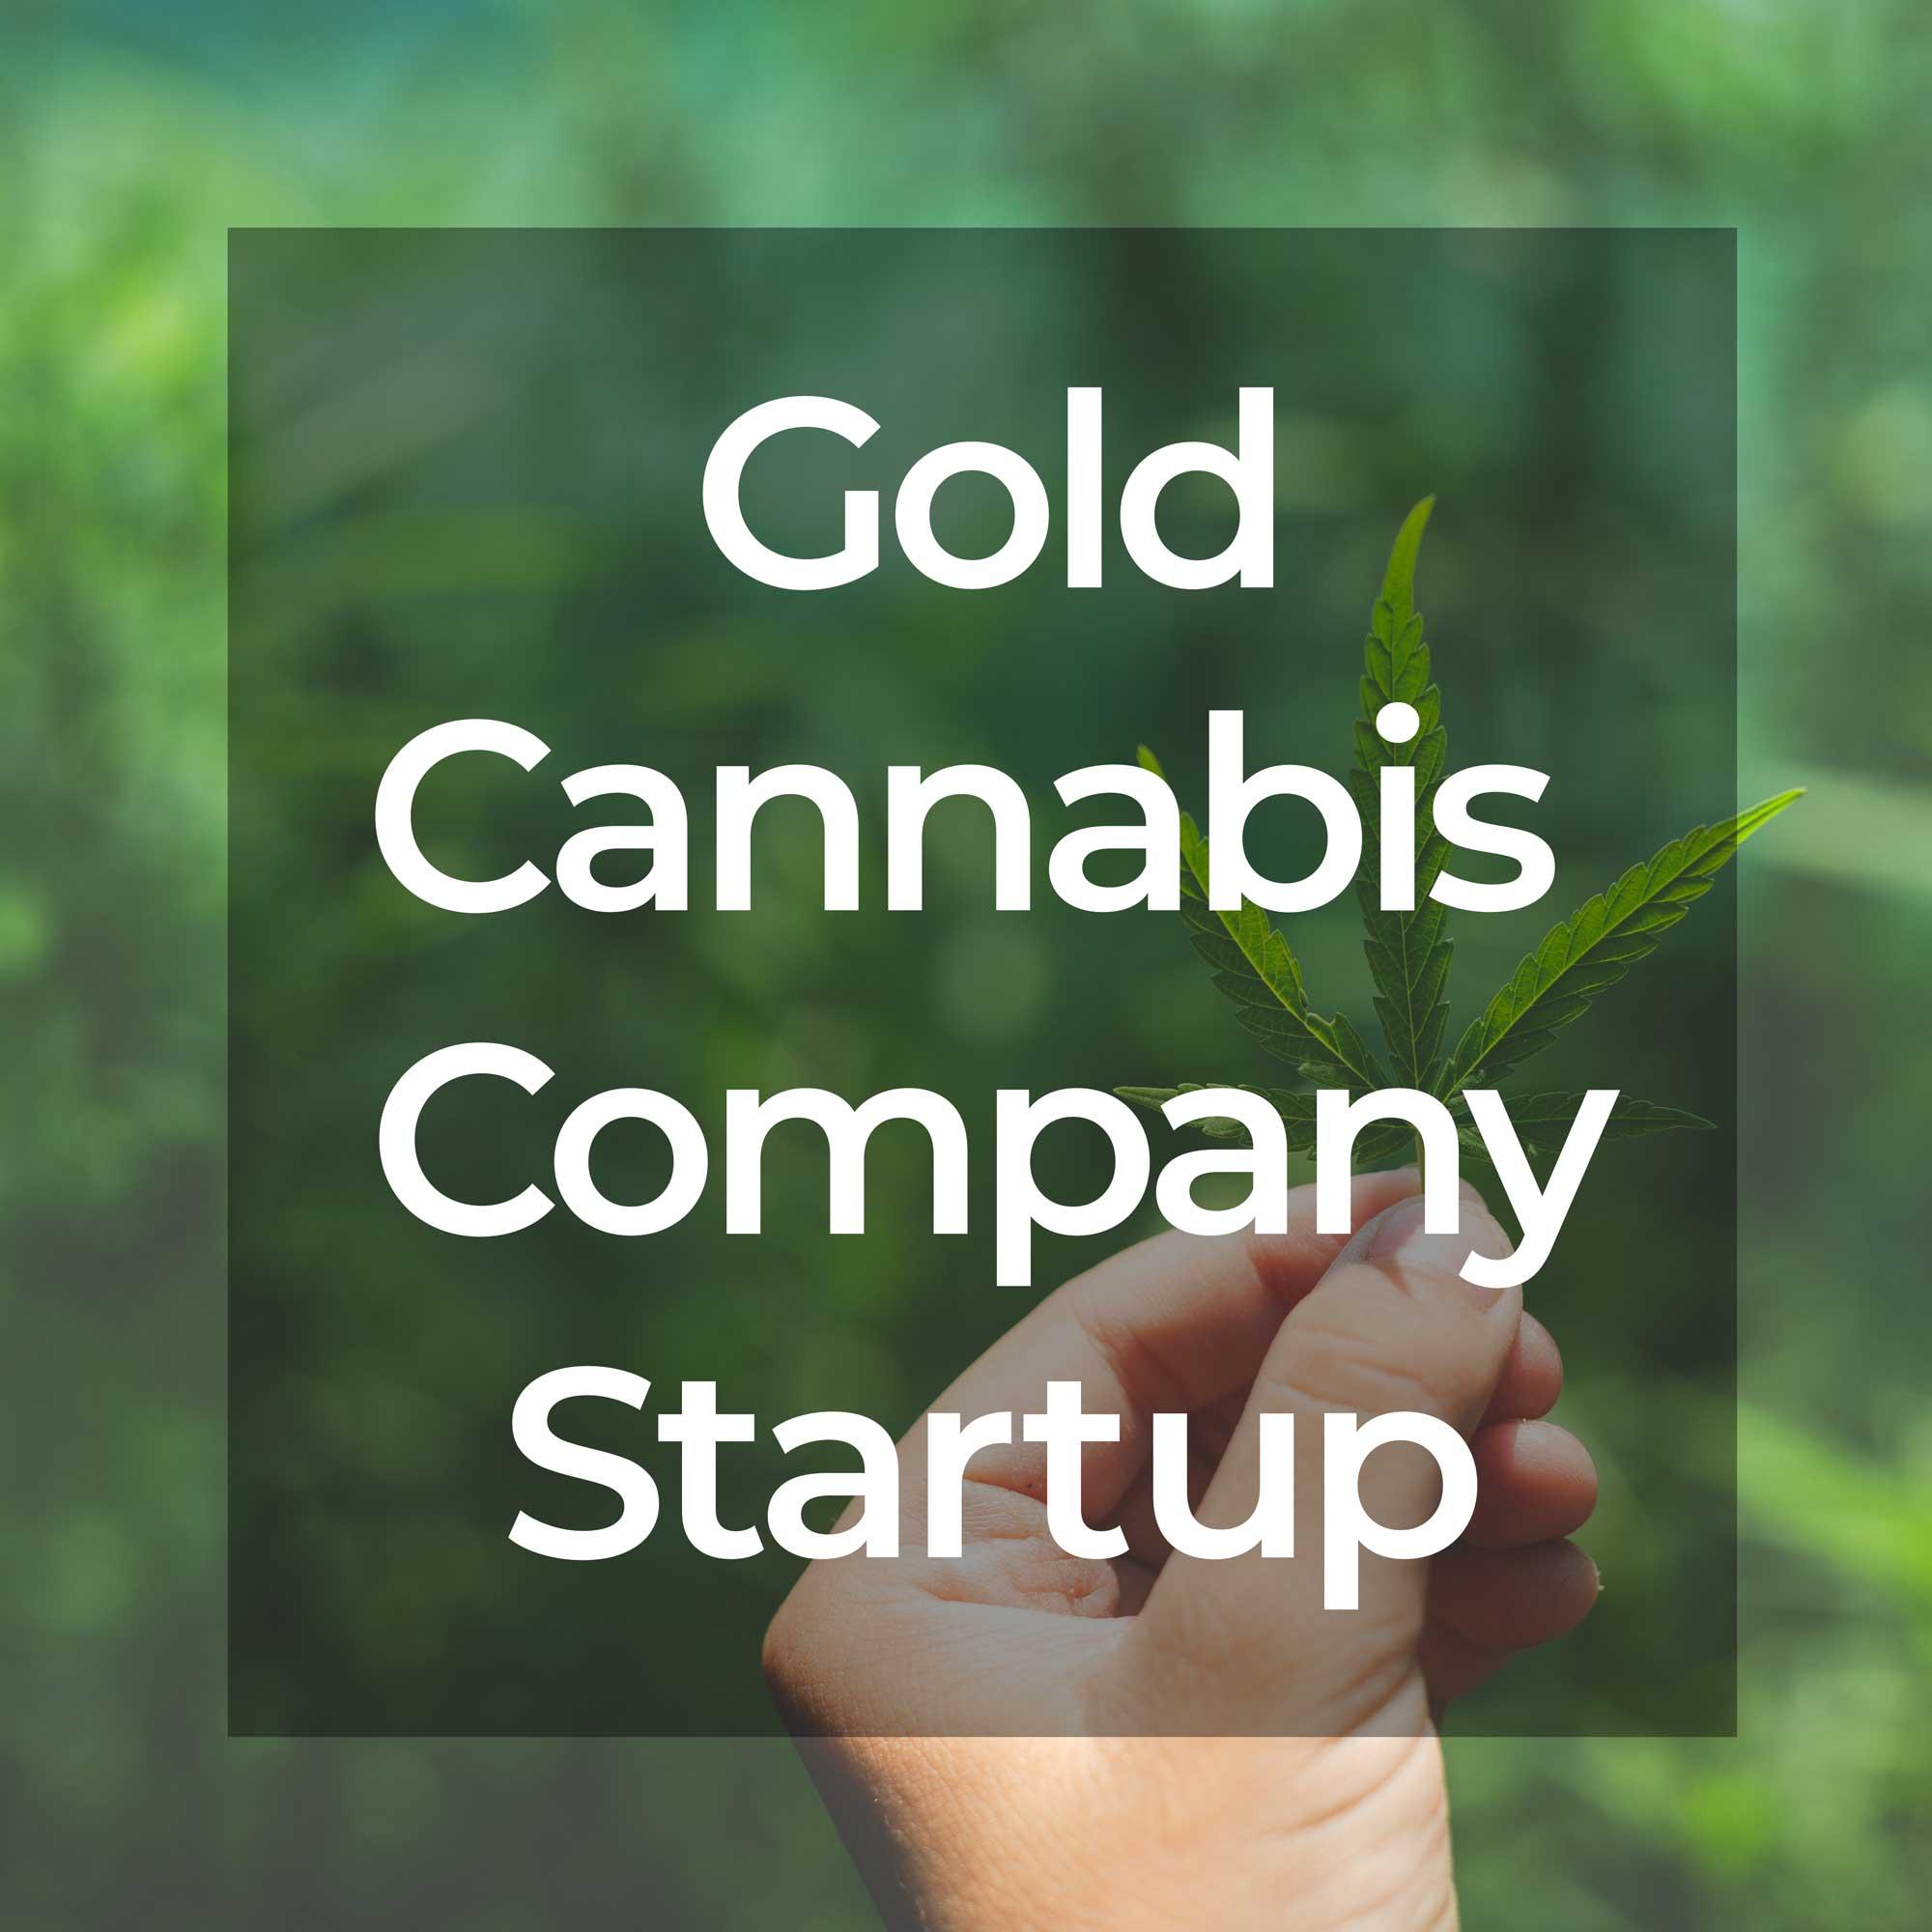 Gold Cannabis Company Startup